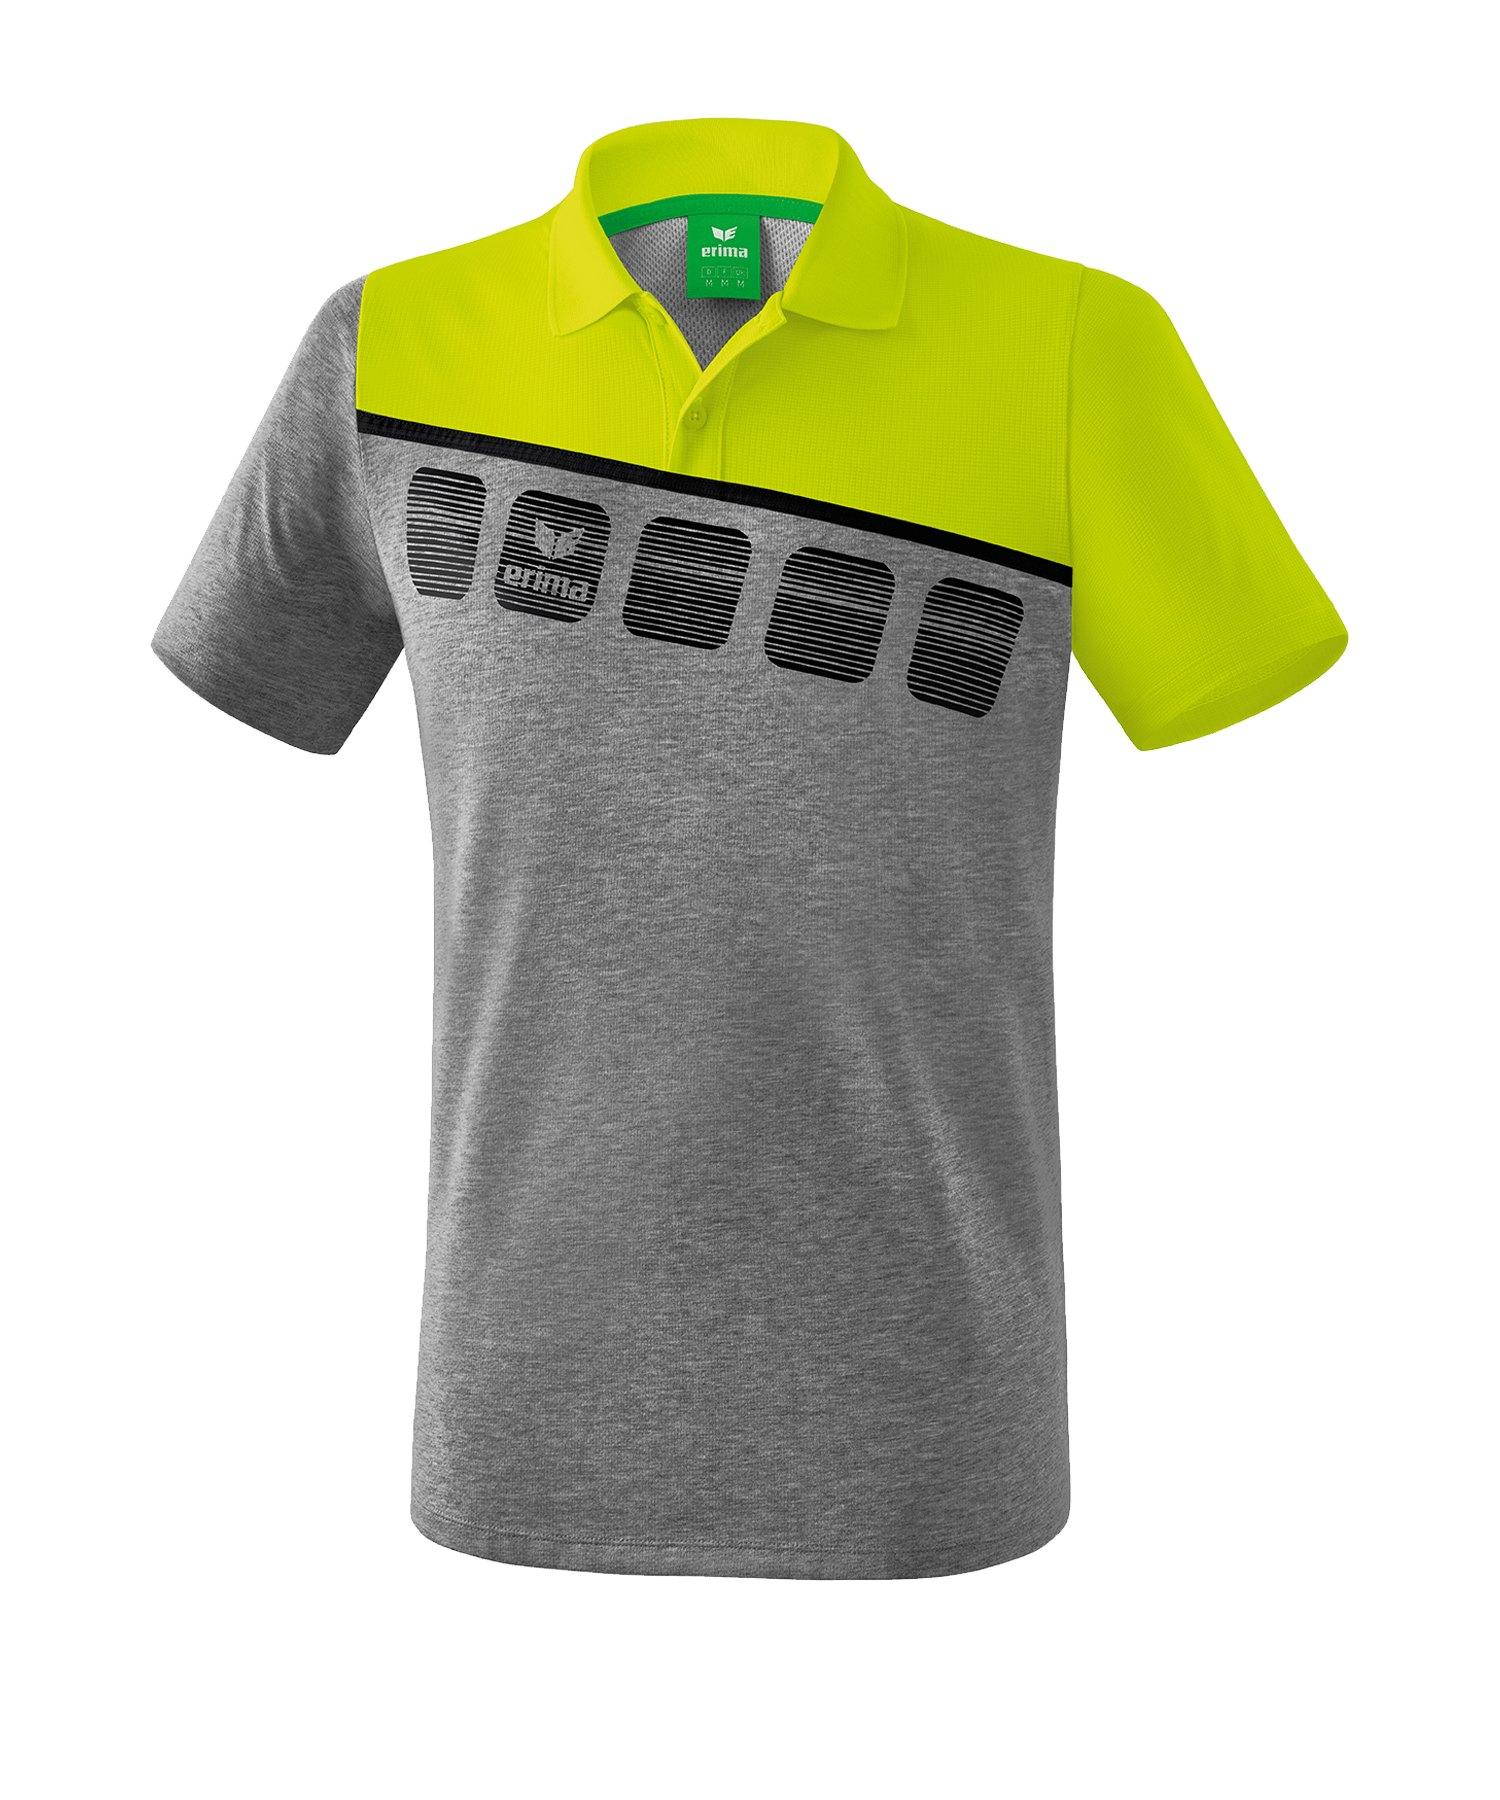 Erima 5-C Poloshirt Kids Grau Grün - Grau